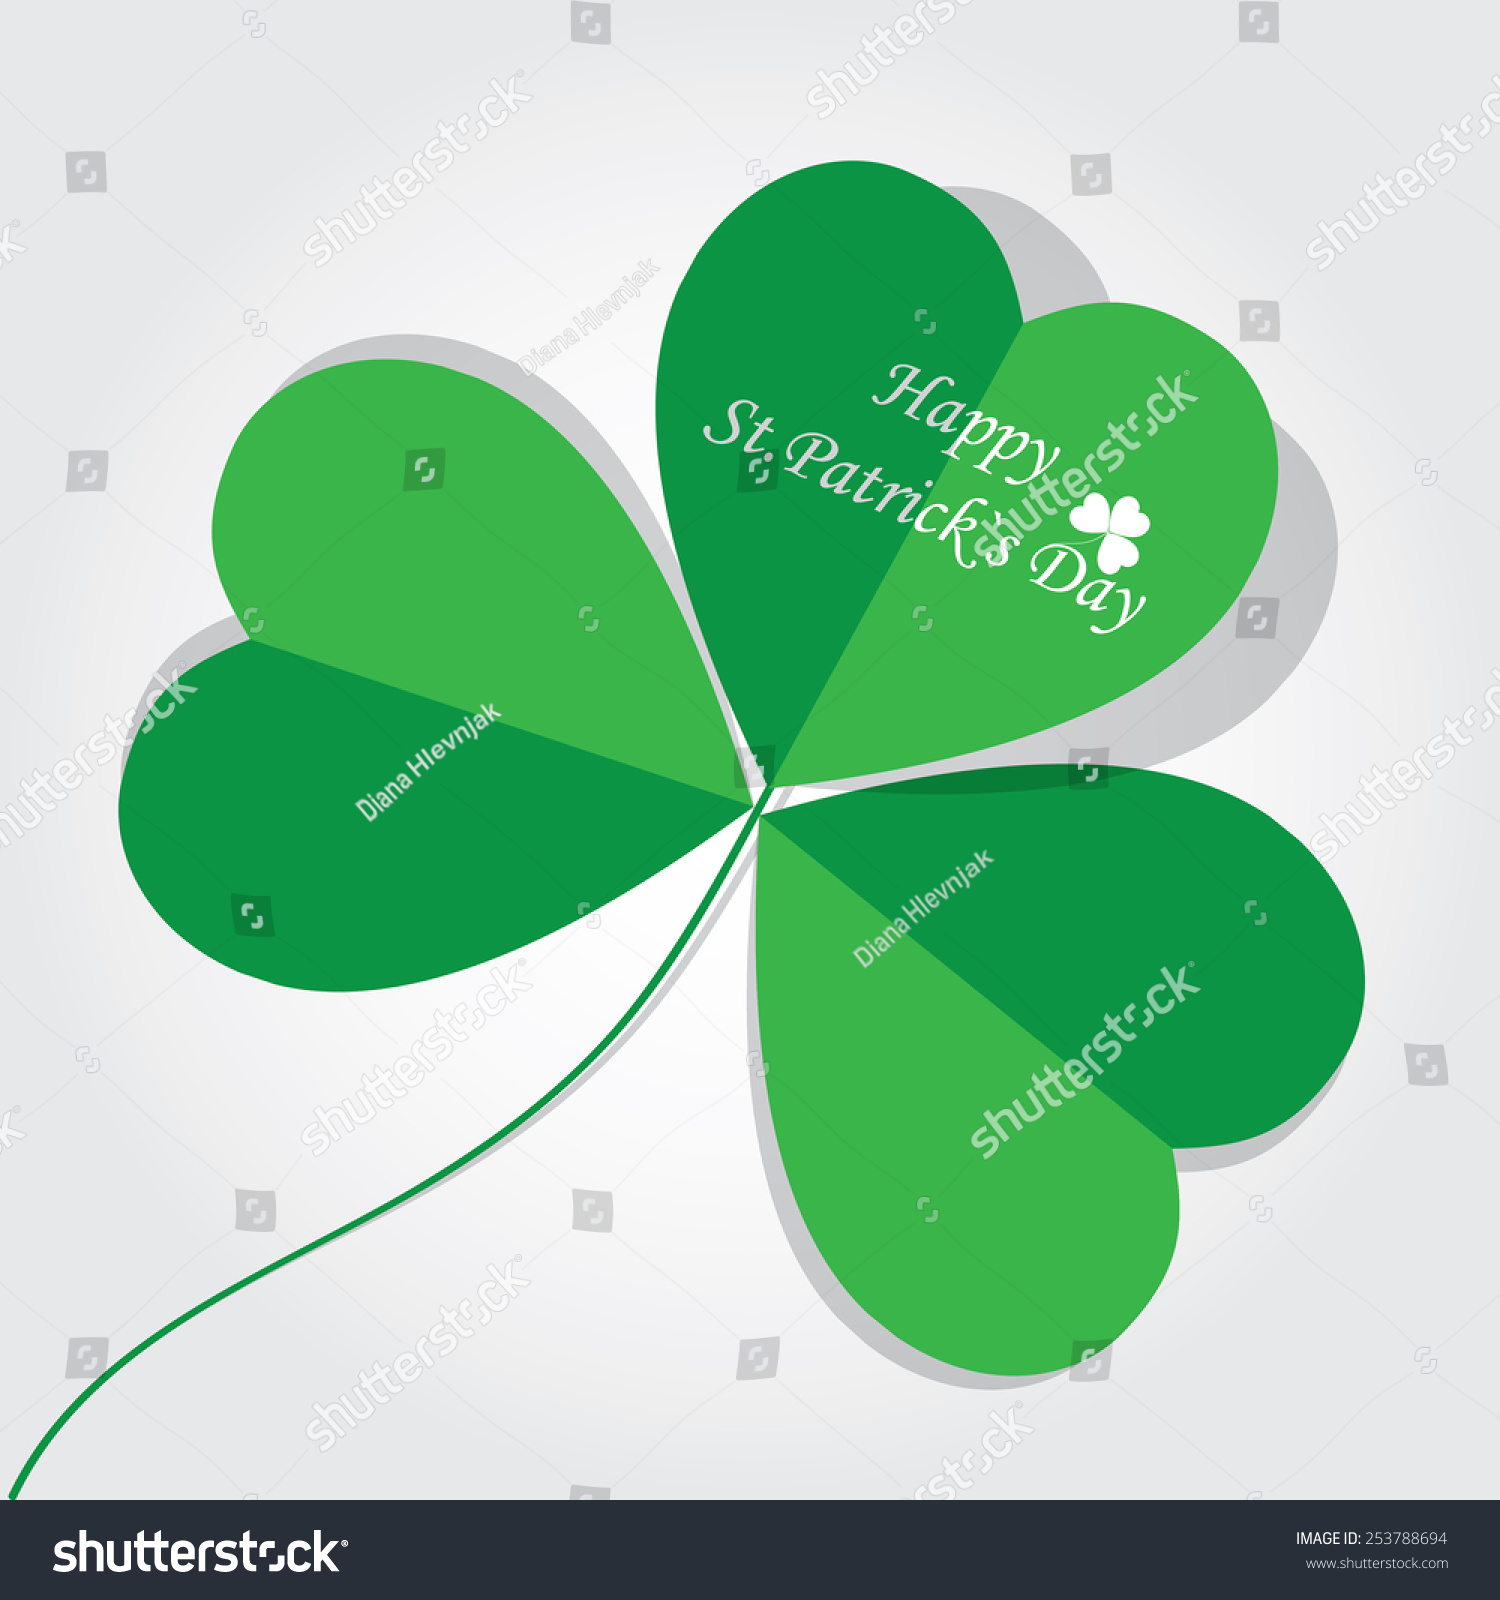 St patricks day irish symbol shamrock stock vector 253788694 st patricks day irish symbol of shamrock three leaved clover plant greeting biocorpaavc Gallery